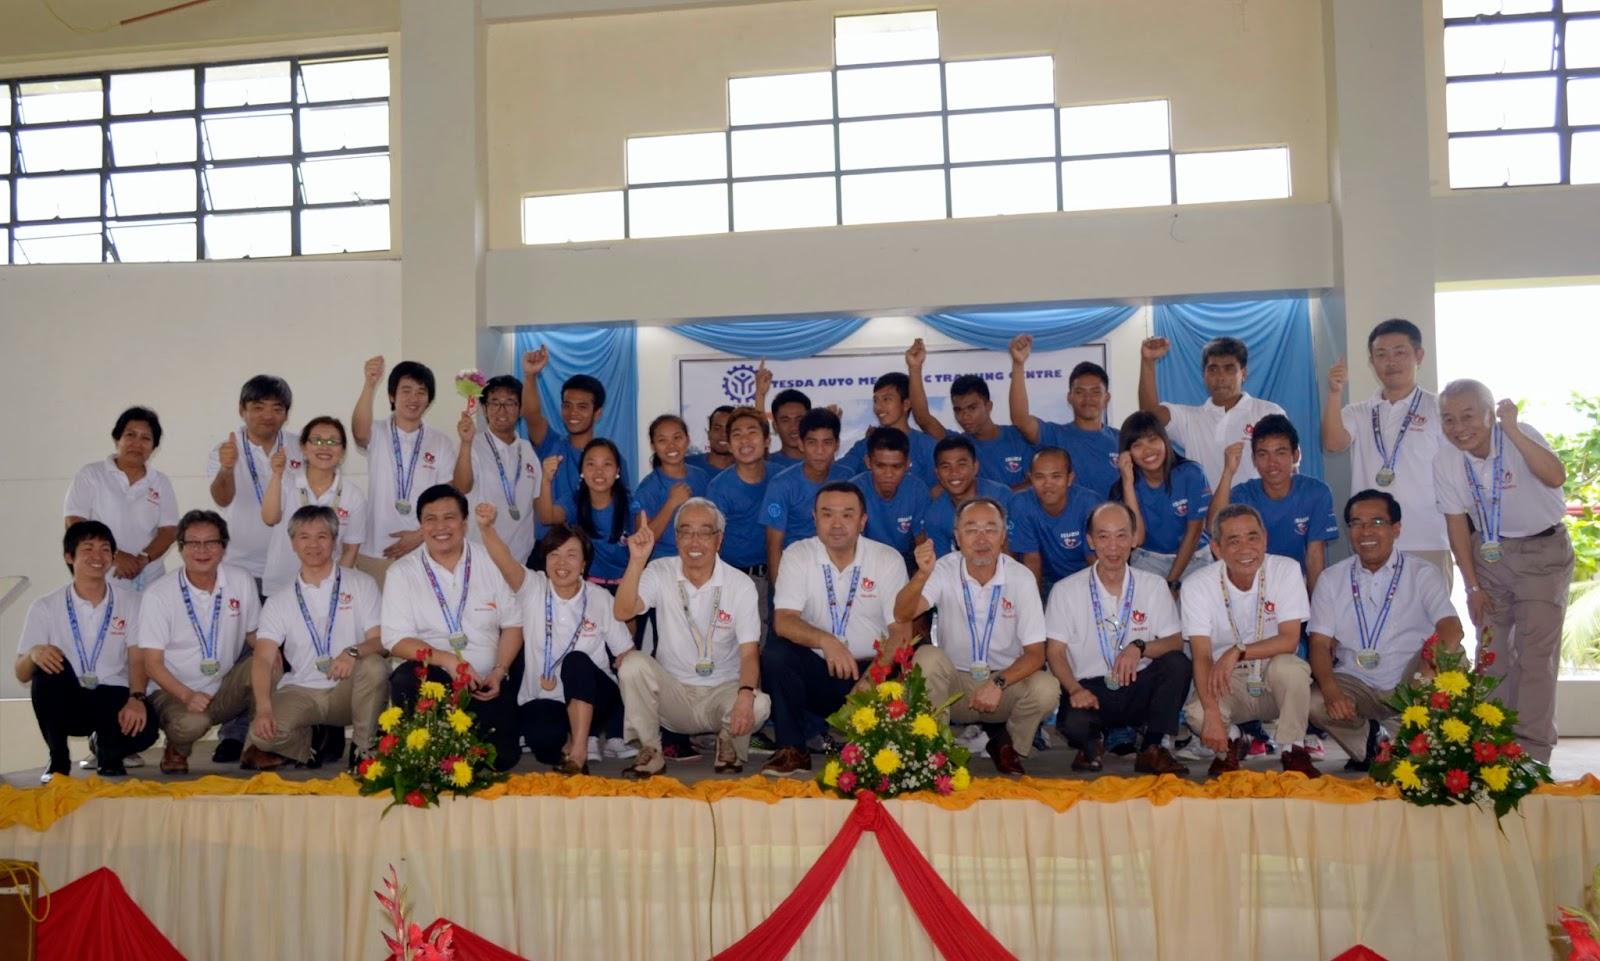 Isuzu Auto Mechanic Training Center in Tacloban